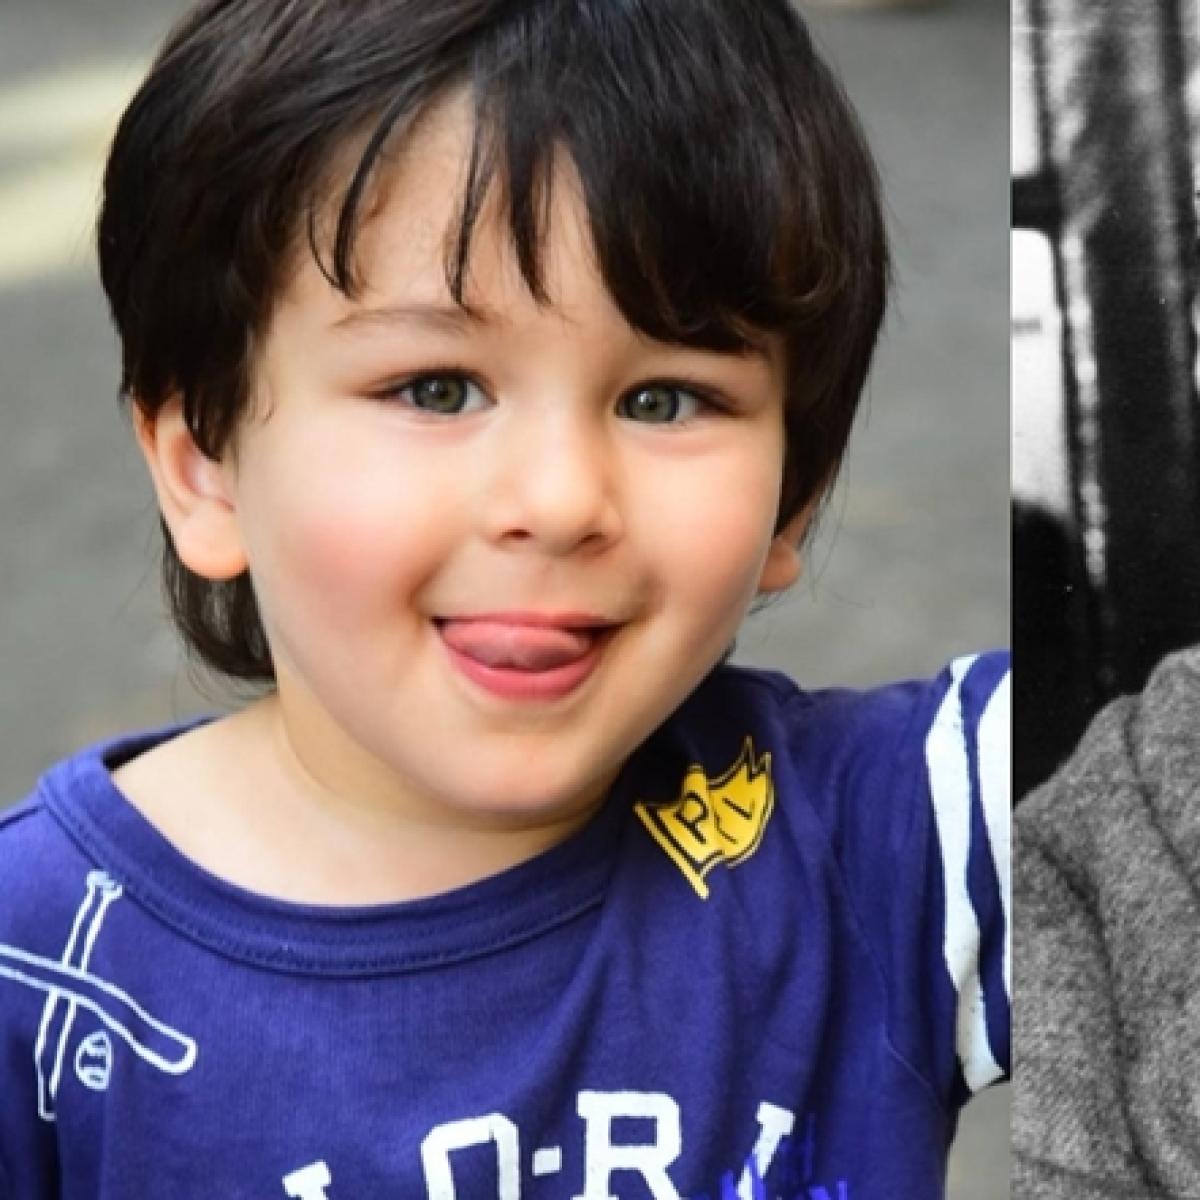 How is Junior Nawab Taimur Ali Khan related to Sanjay Gandhi?